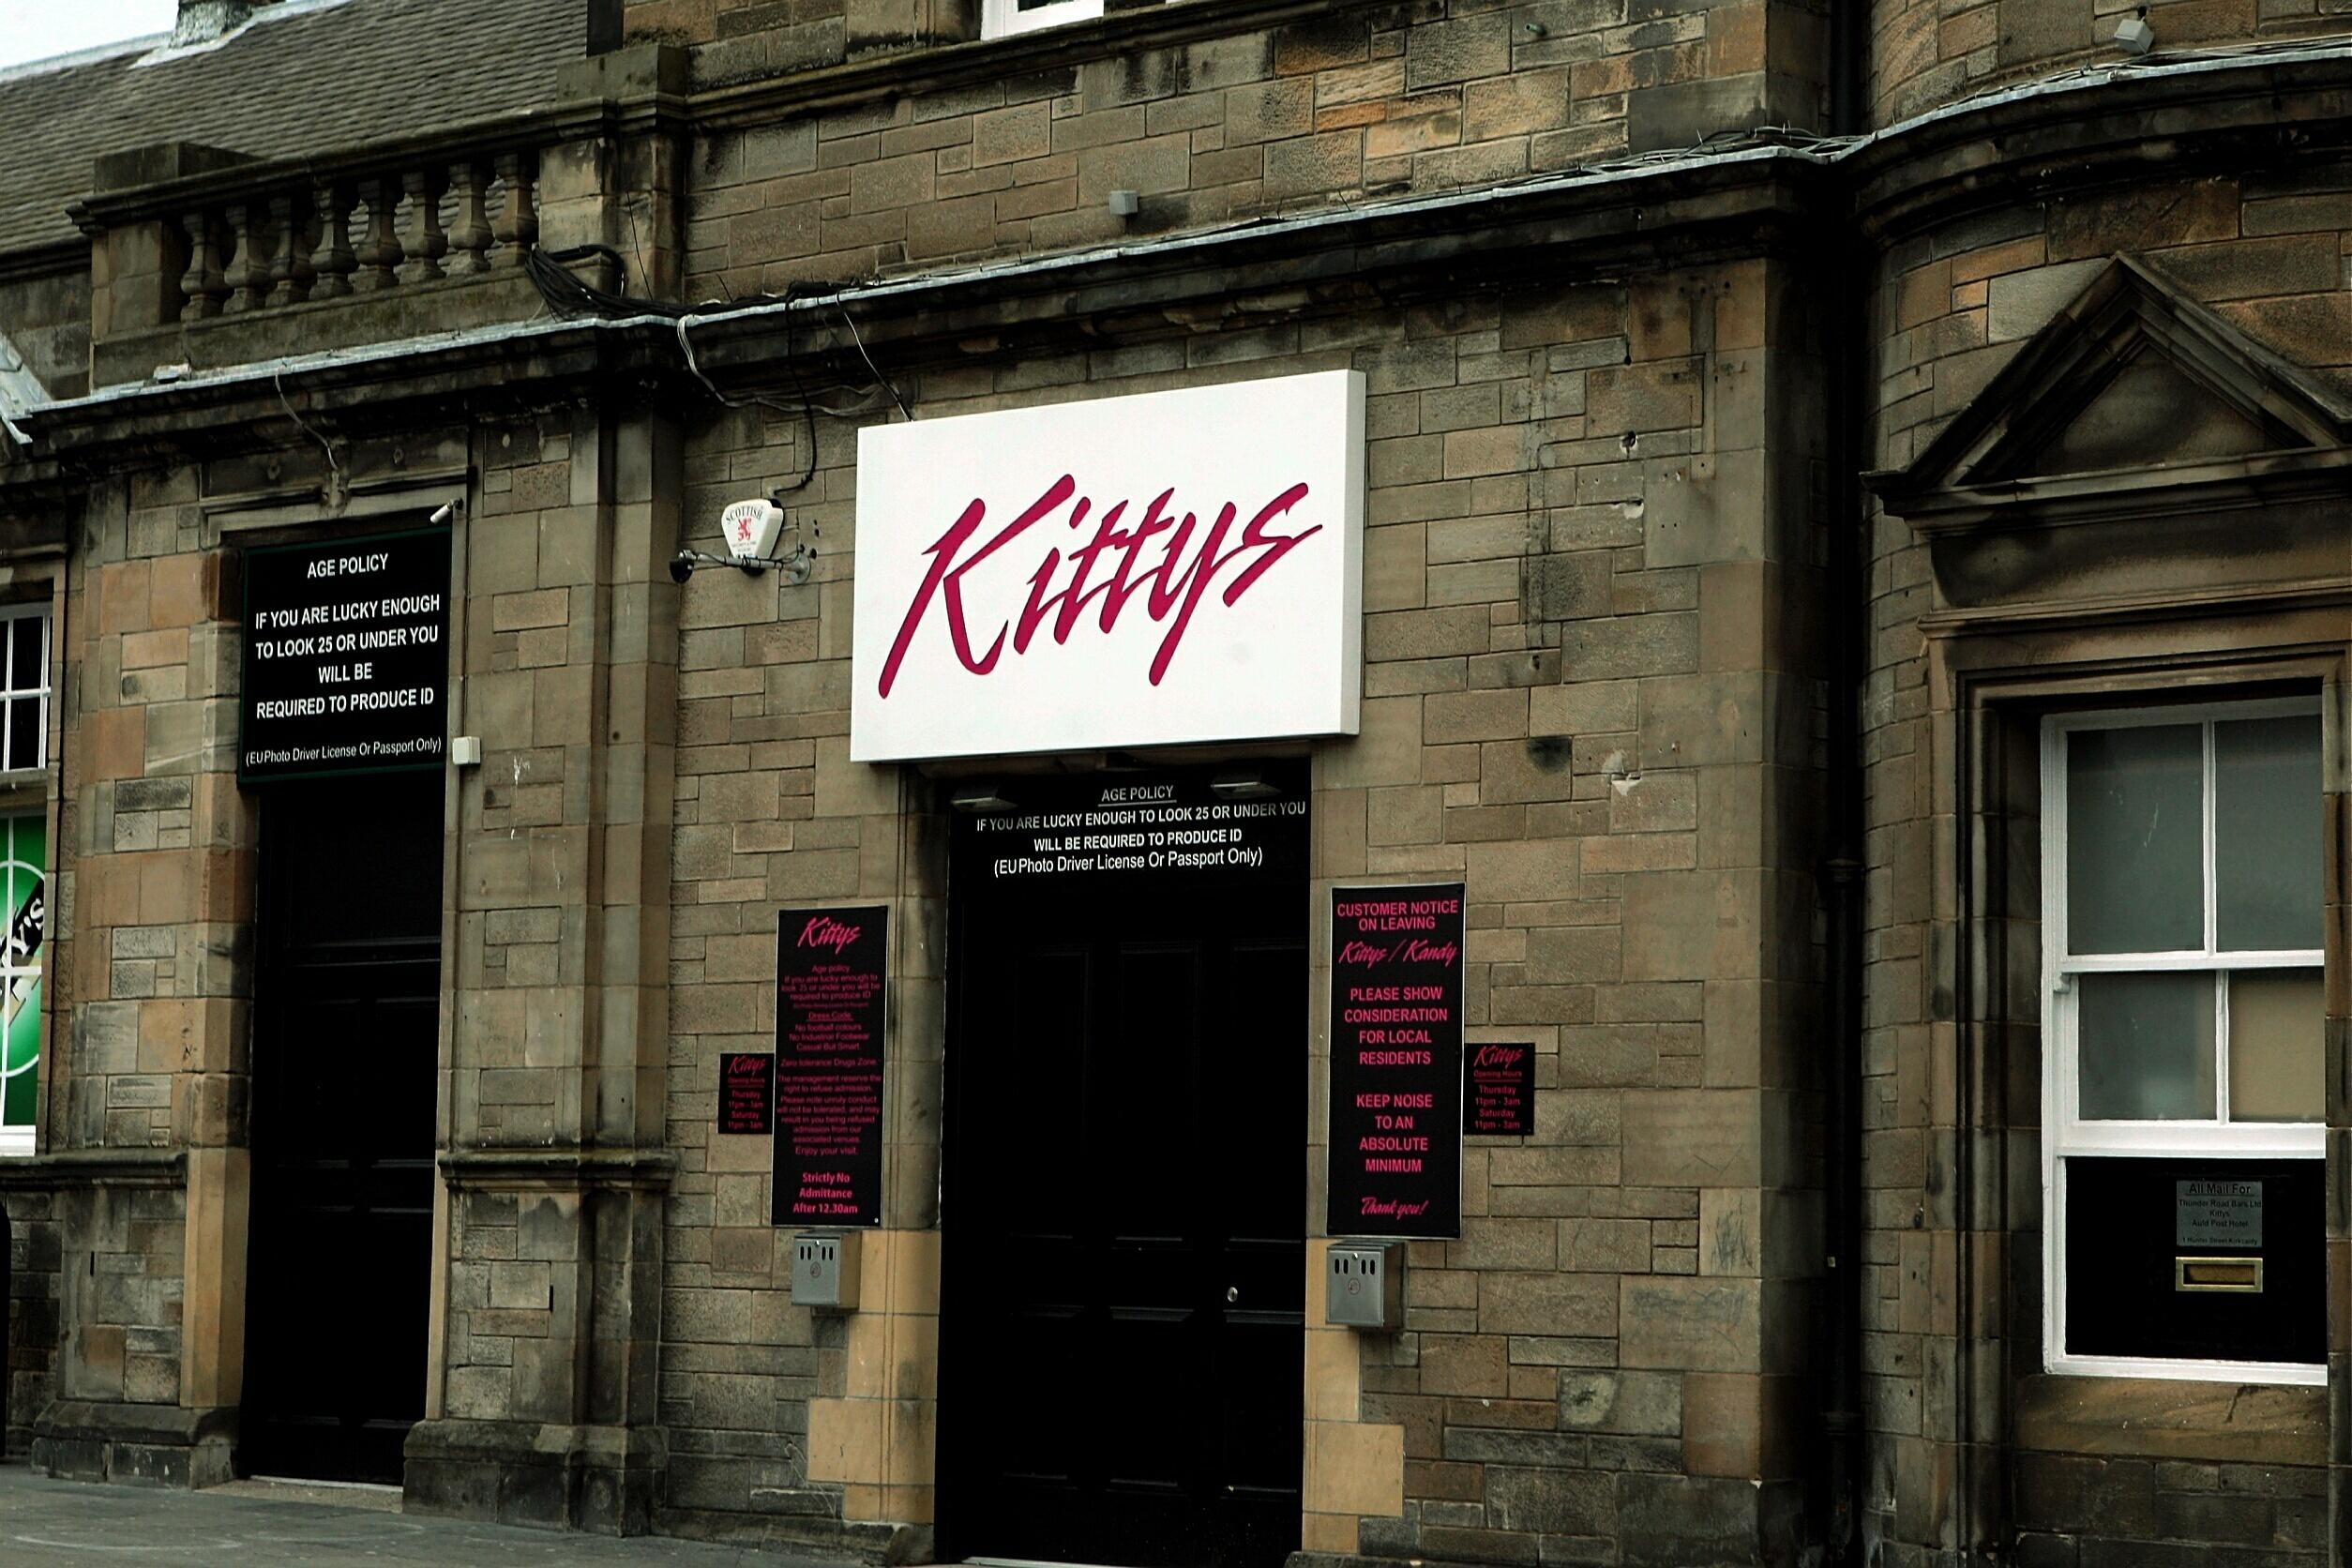 Kitty's nightclub in Kirkcaldy.